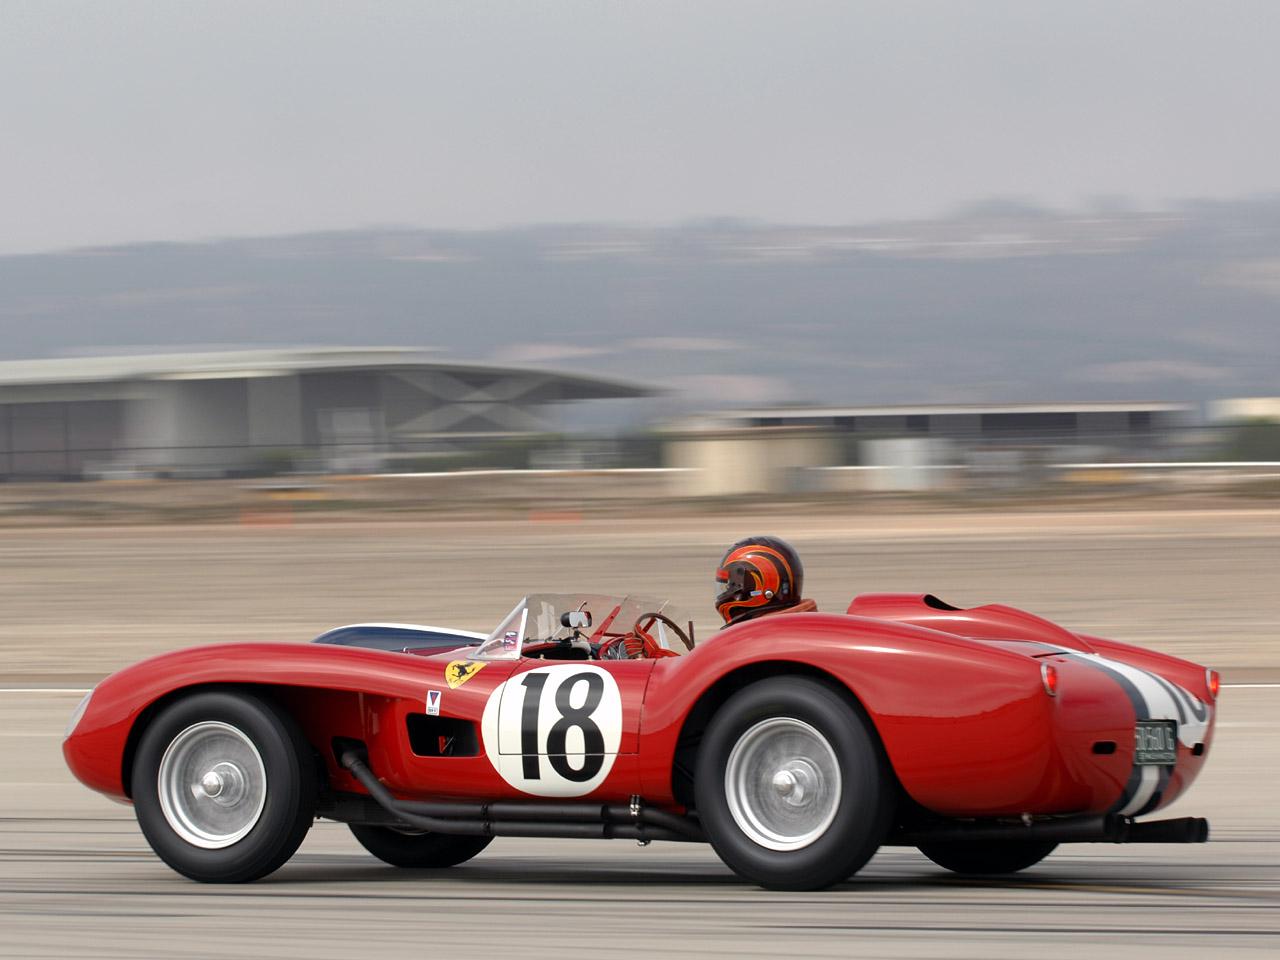 3dtuning of ferrari 250 testa rossa coupe 1957 3dtuning